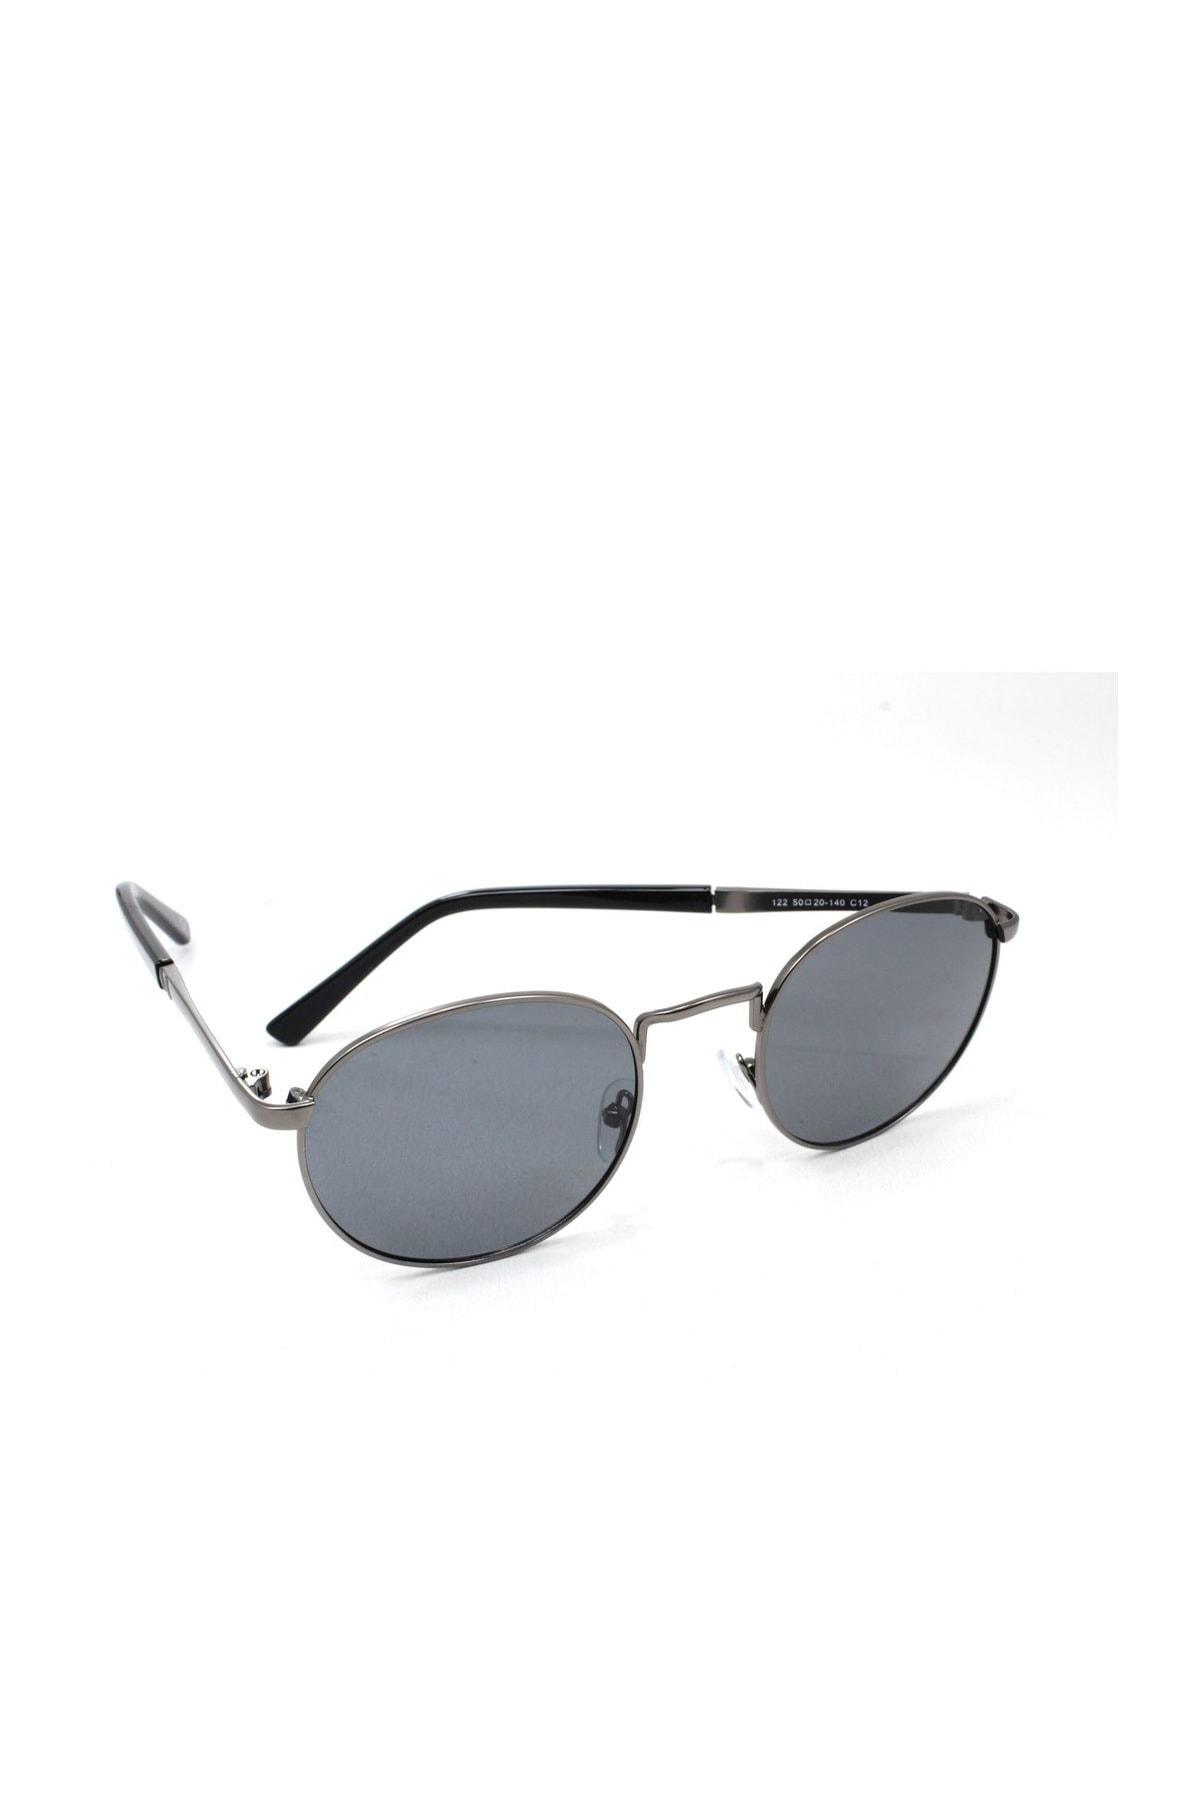 عینک آفتابی زنانه ترک مجلسی برند JULIANO رنگ متالیک کد ty33187736